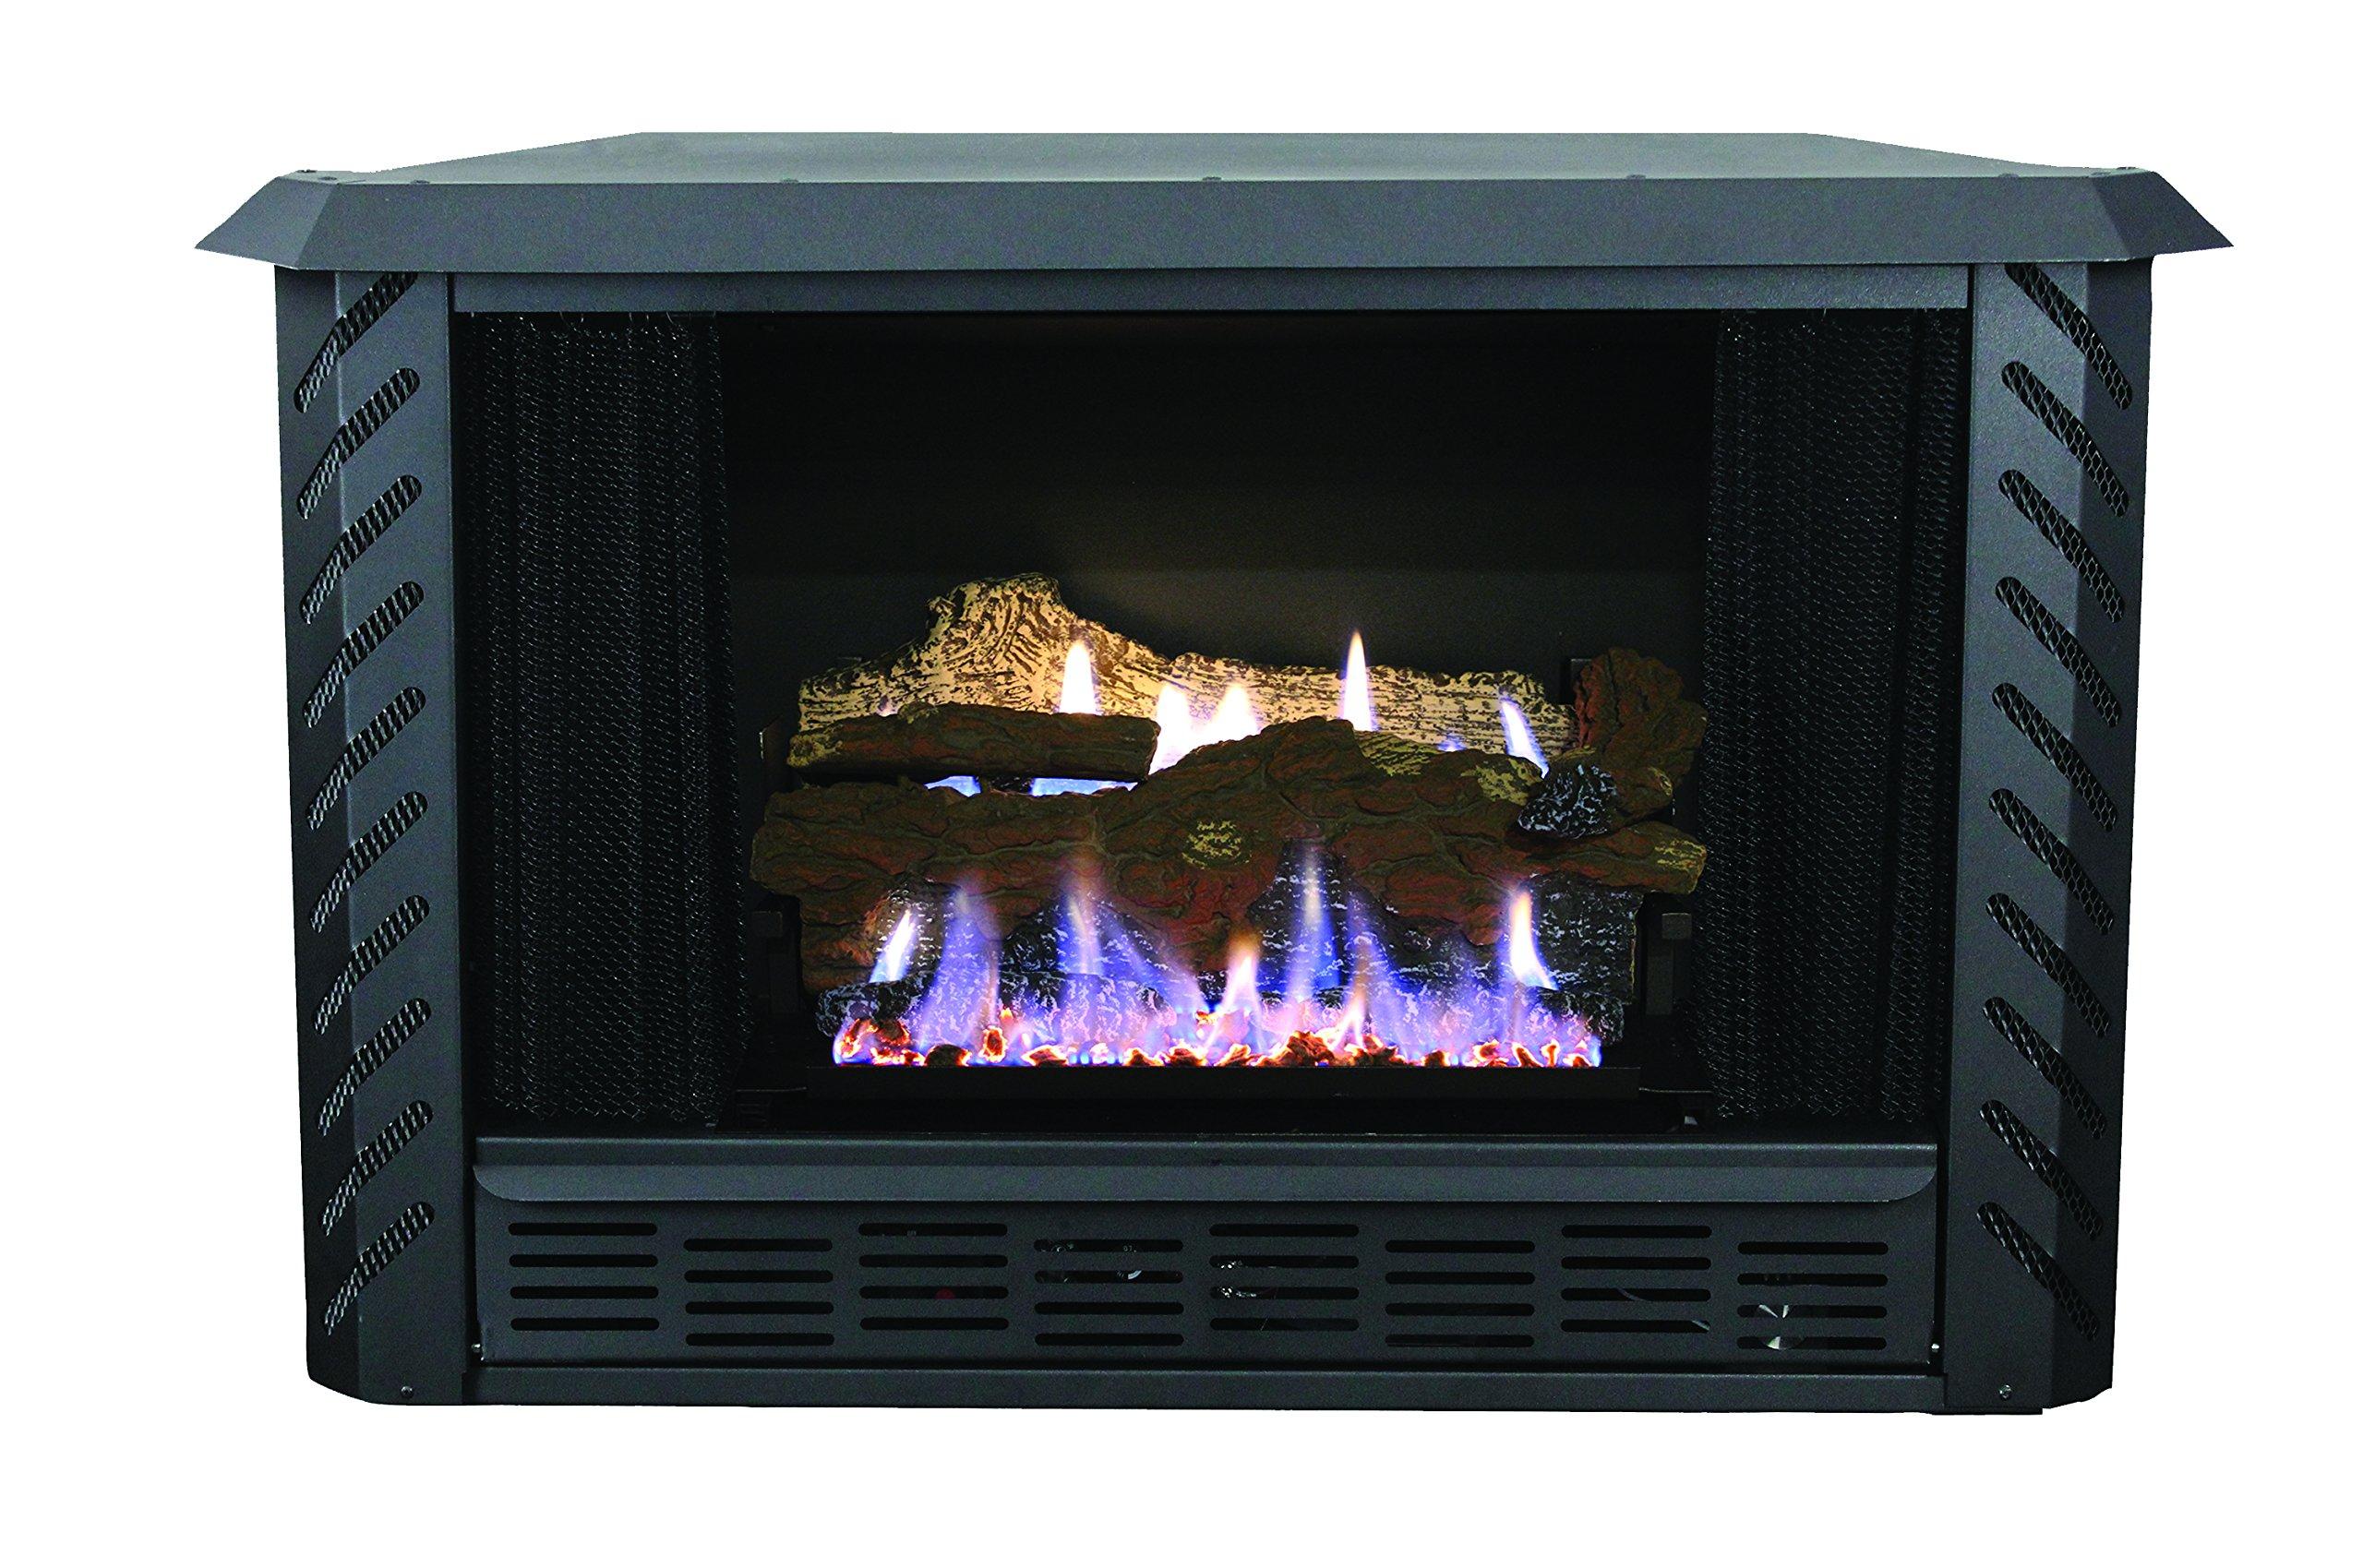 Ashley AGVF340LP Vent-Free Propane Gas Firebox, 34,000 BTUs by Ashley